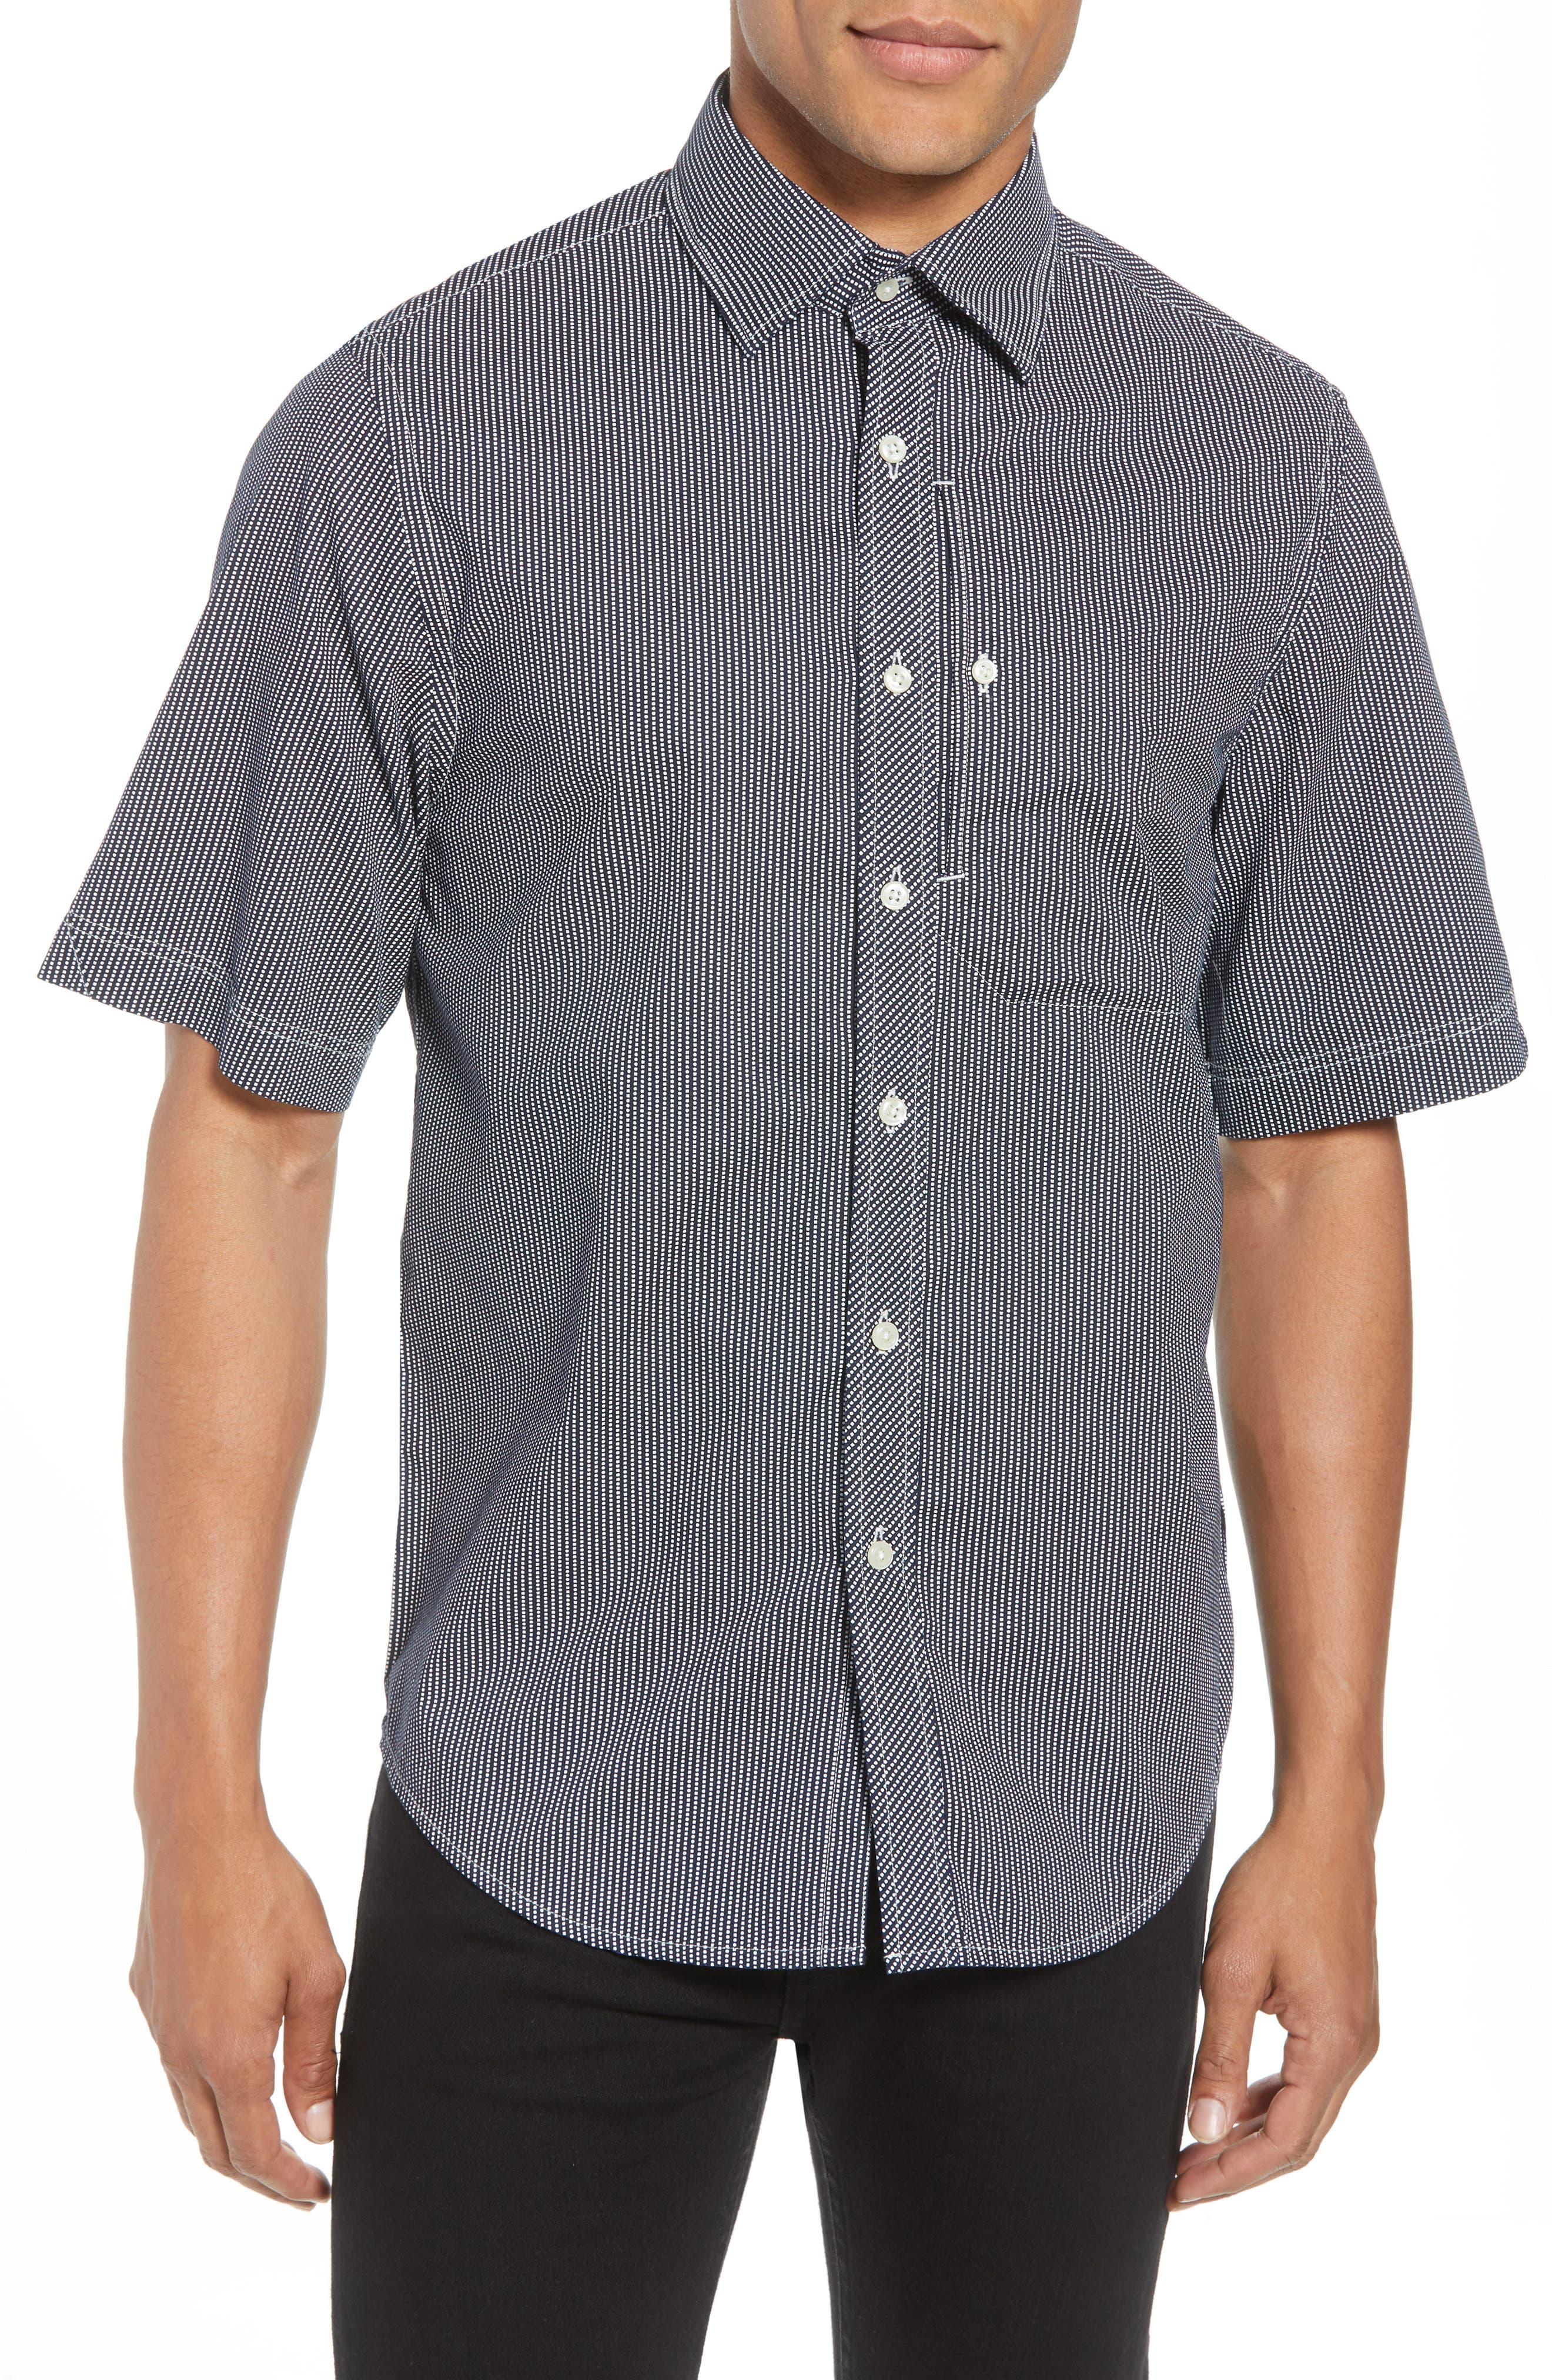 Bristum Straight Ref Shirt,                         Main,                         color, 400